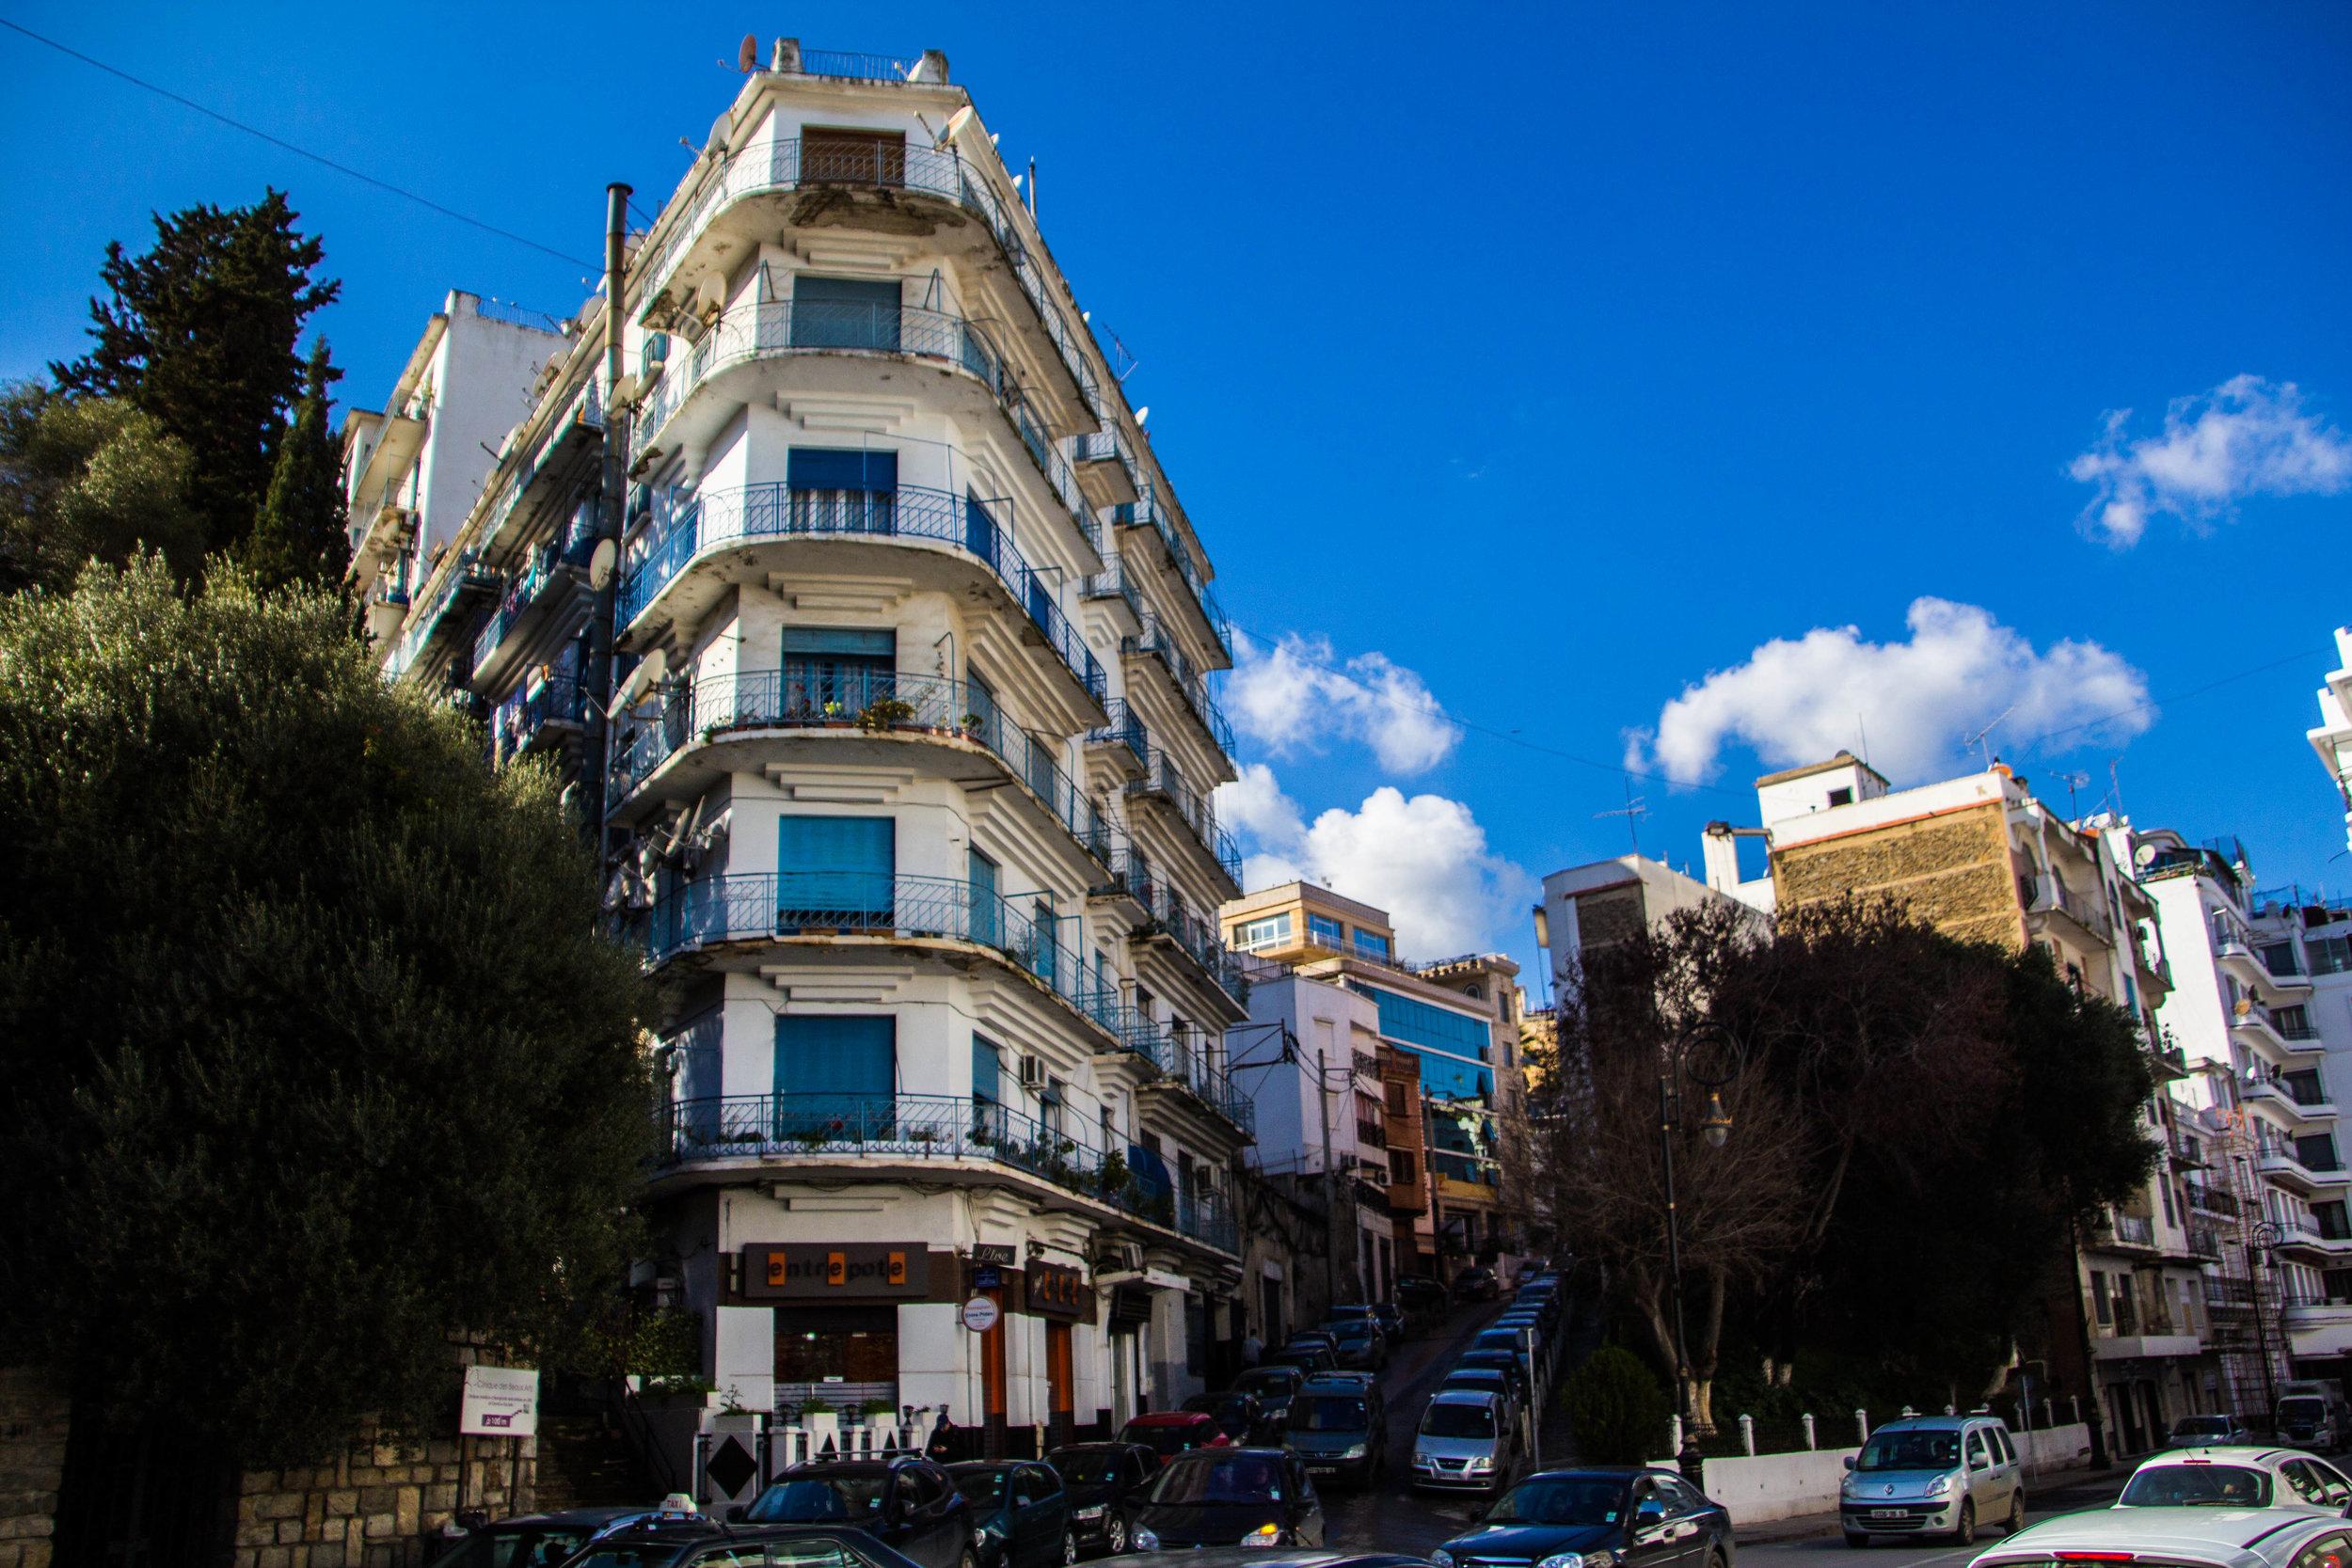 streets-algiers-algeria-1.jpg